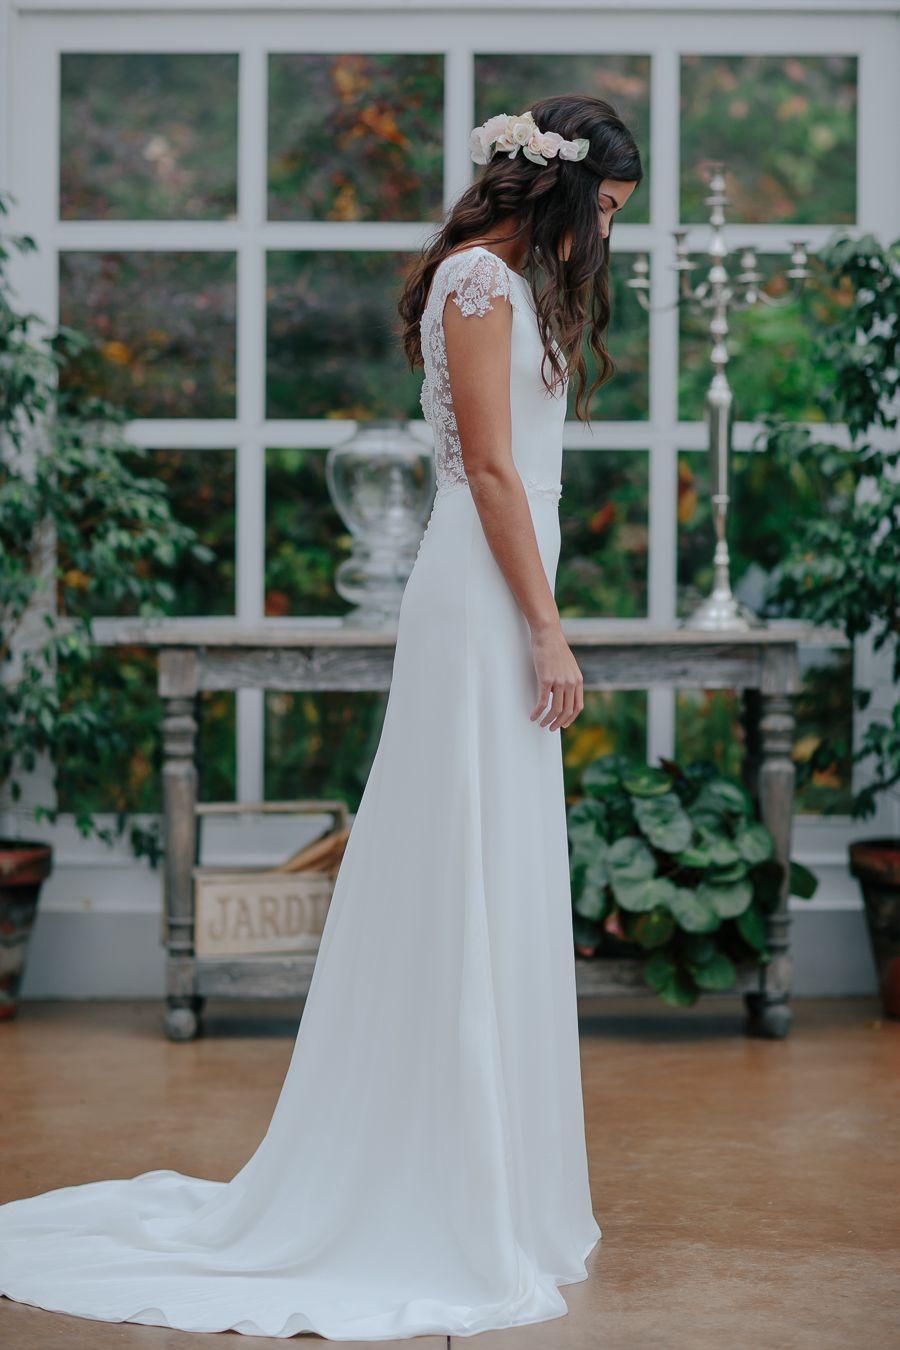 Rubianes Foto 2 3 | Dresses | Pinterest | Vestidos de novia, De ...